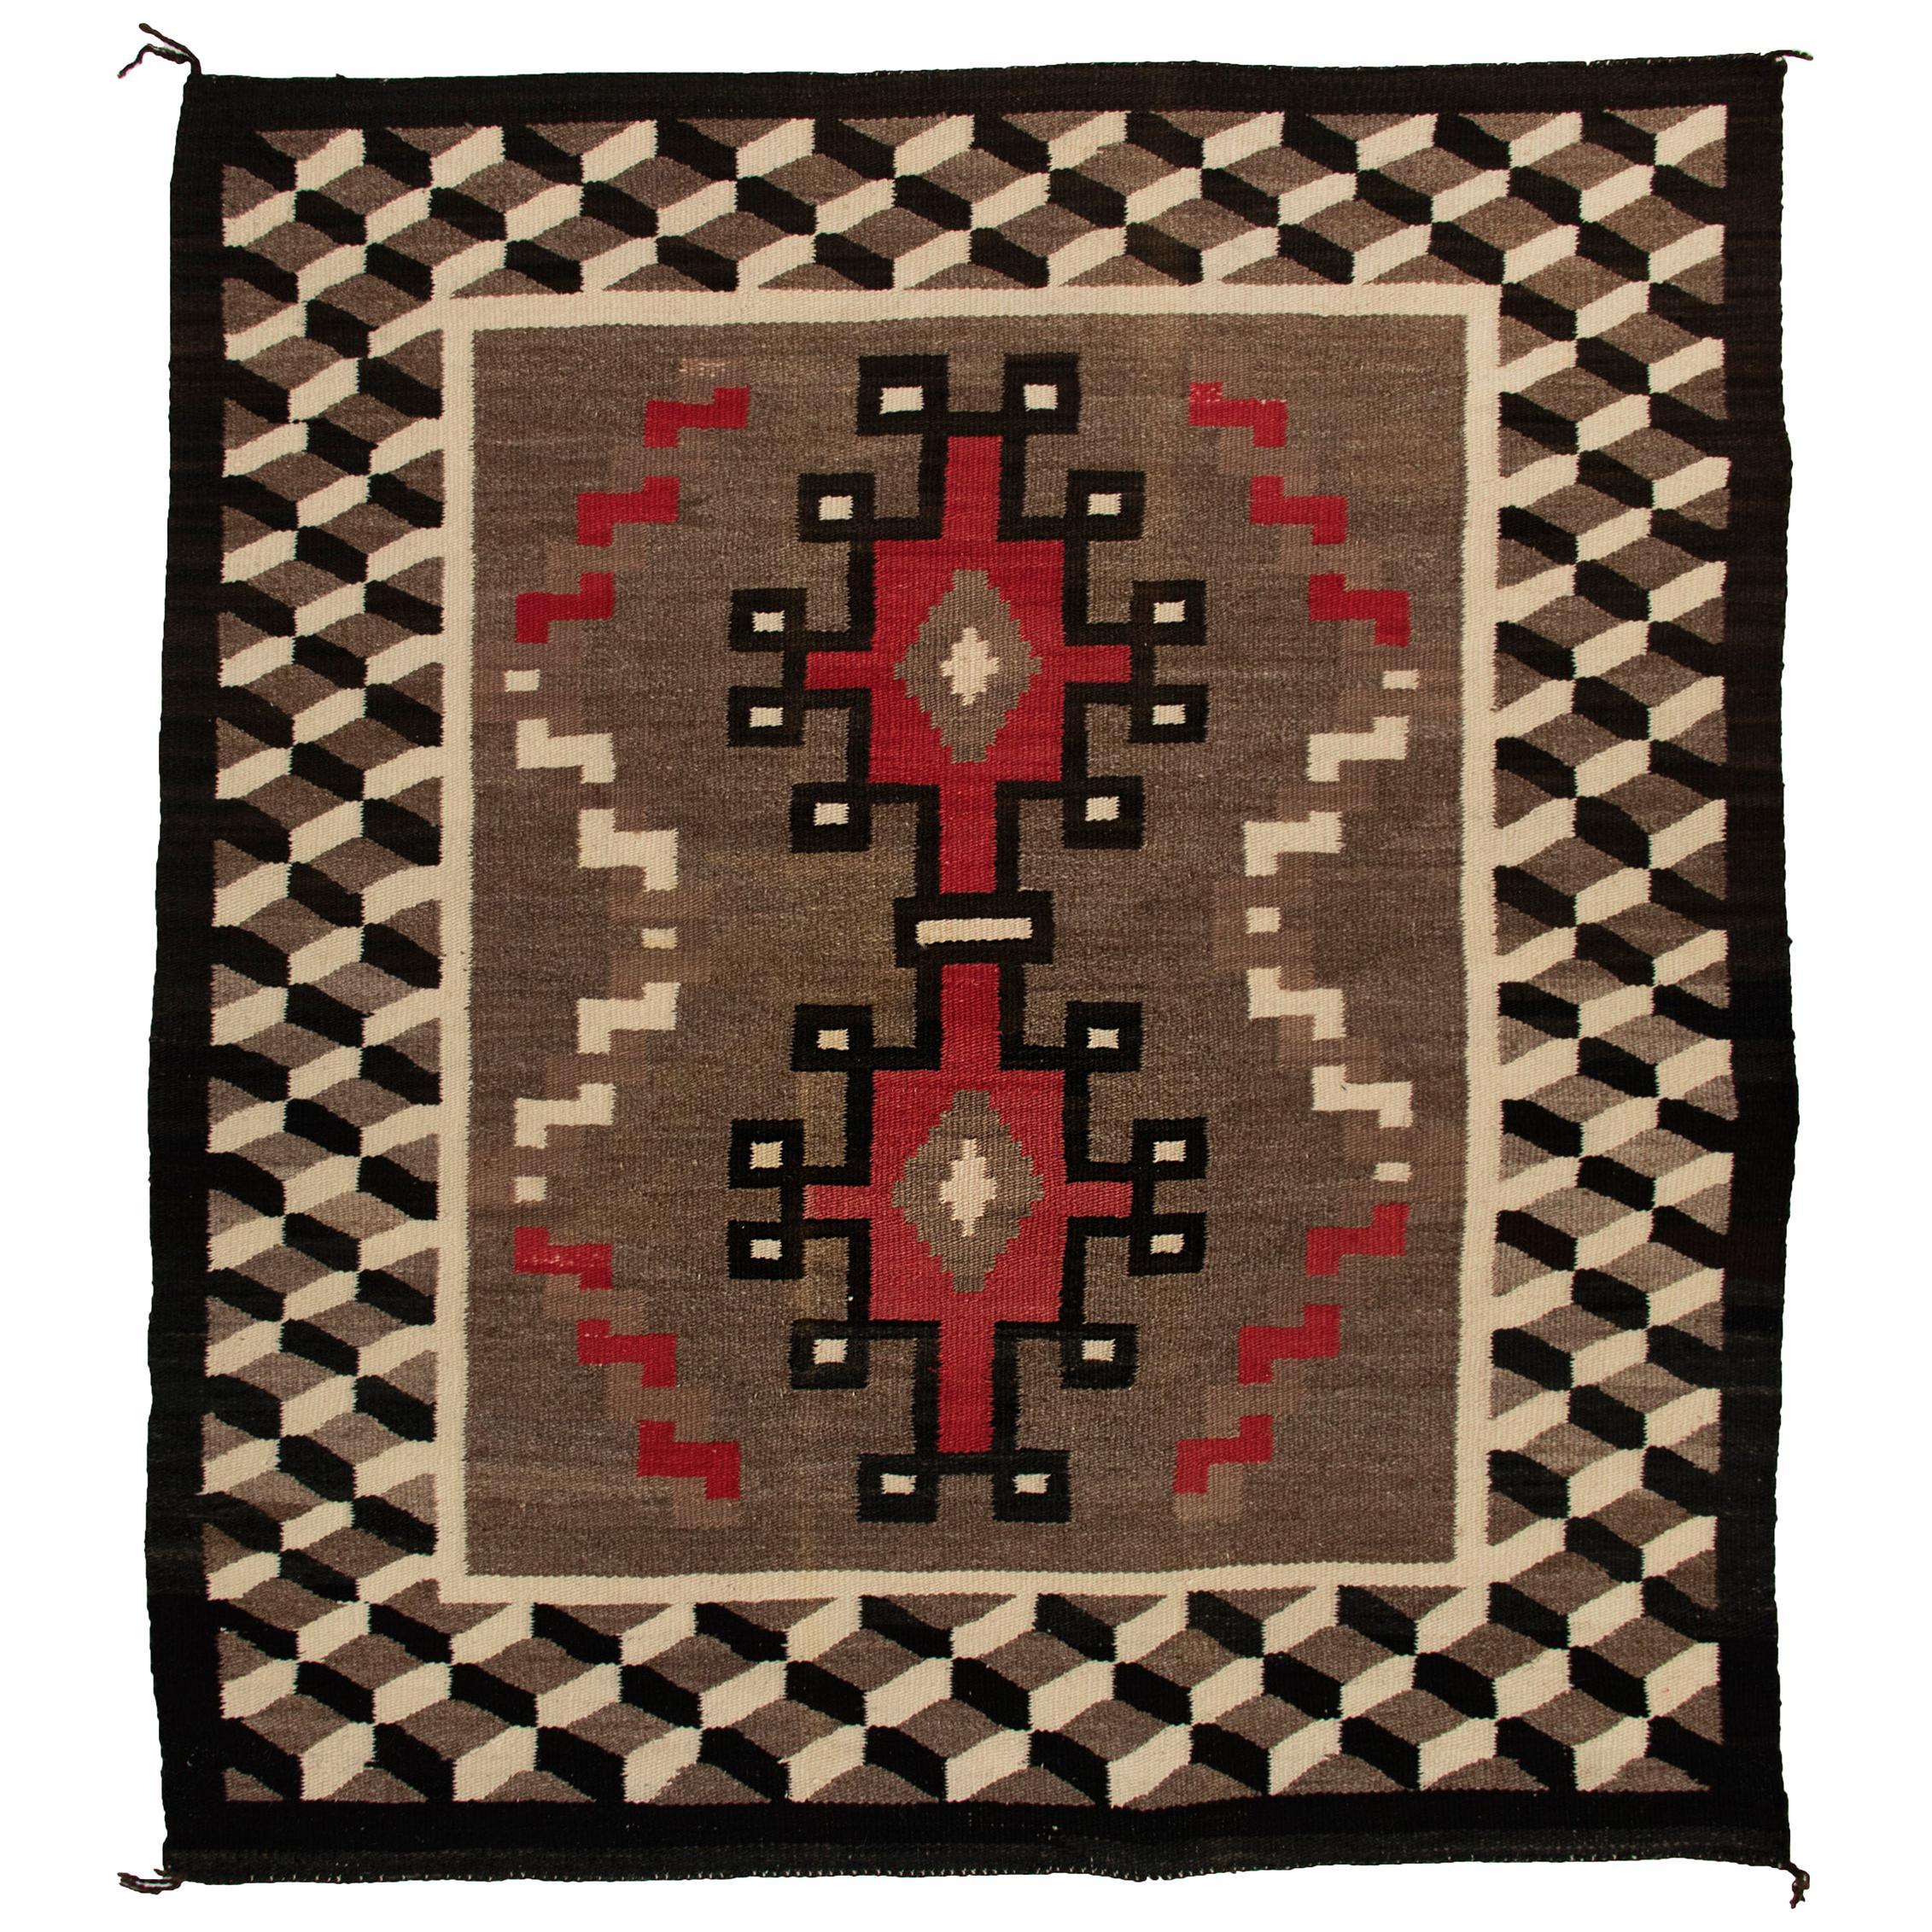 Vintage Navajo Rug, circa 1940, Southwestern Textile, Brown, Black, Red, Ivory